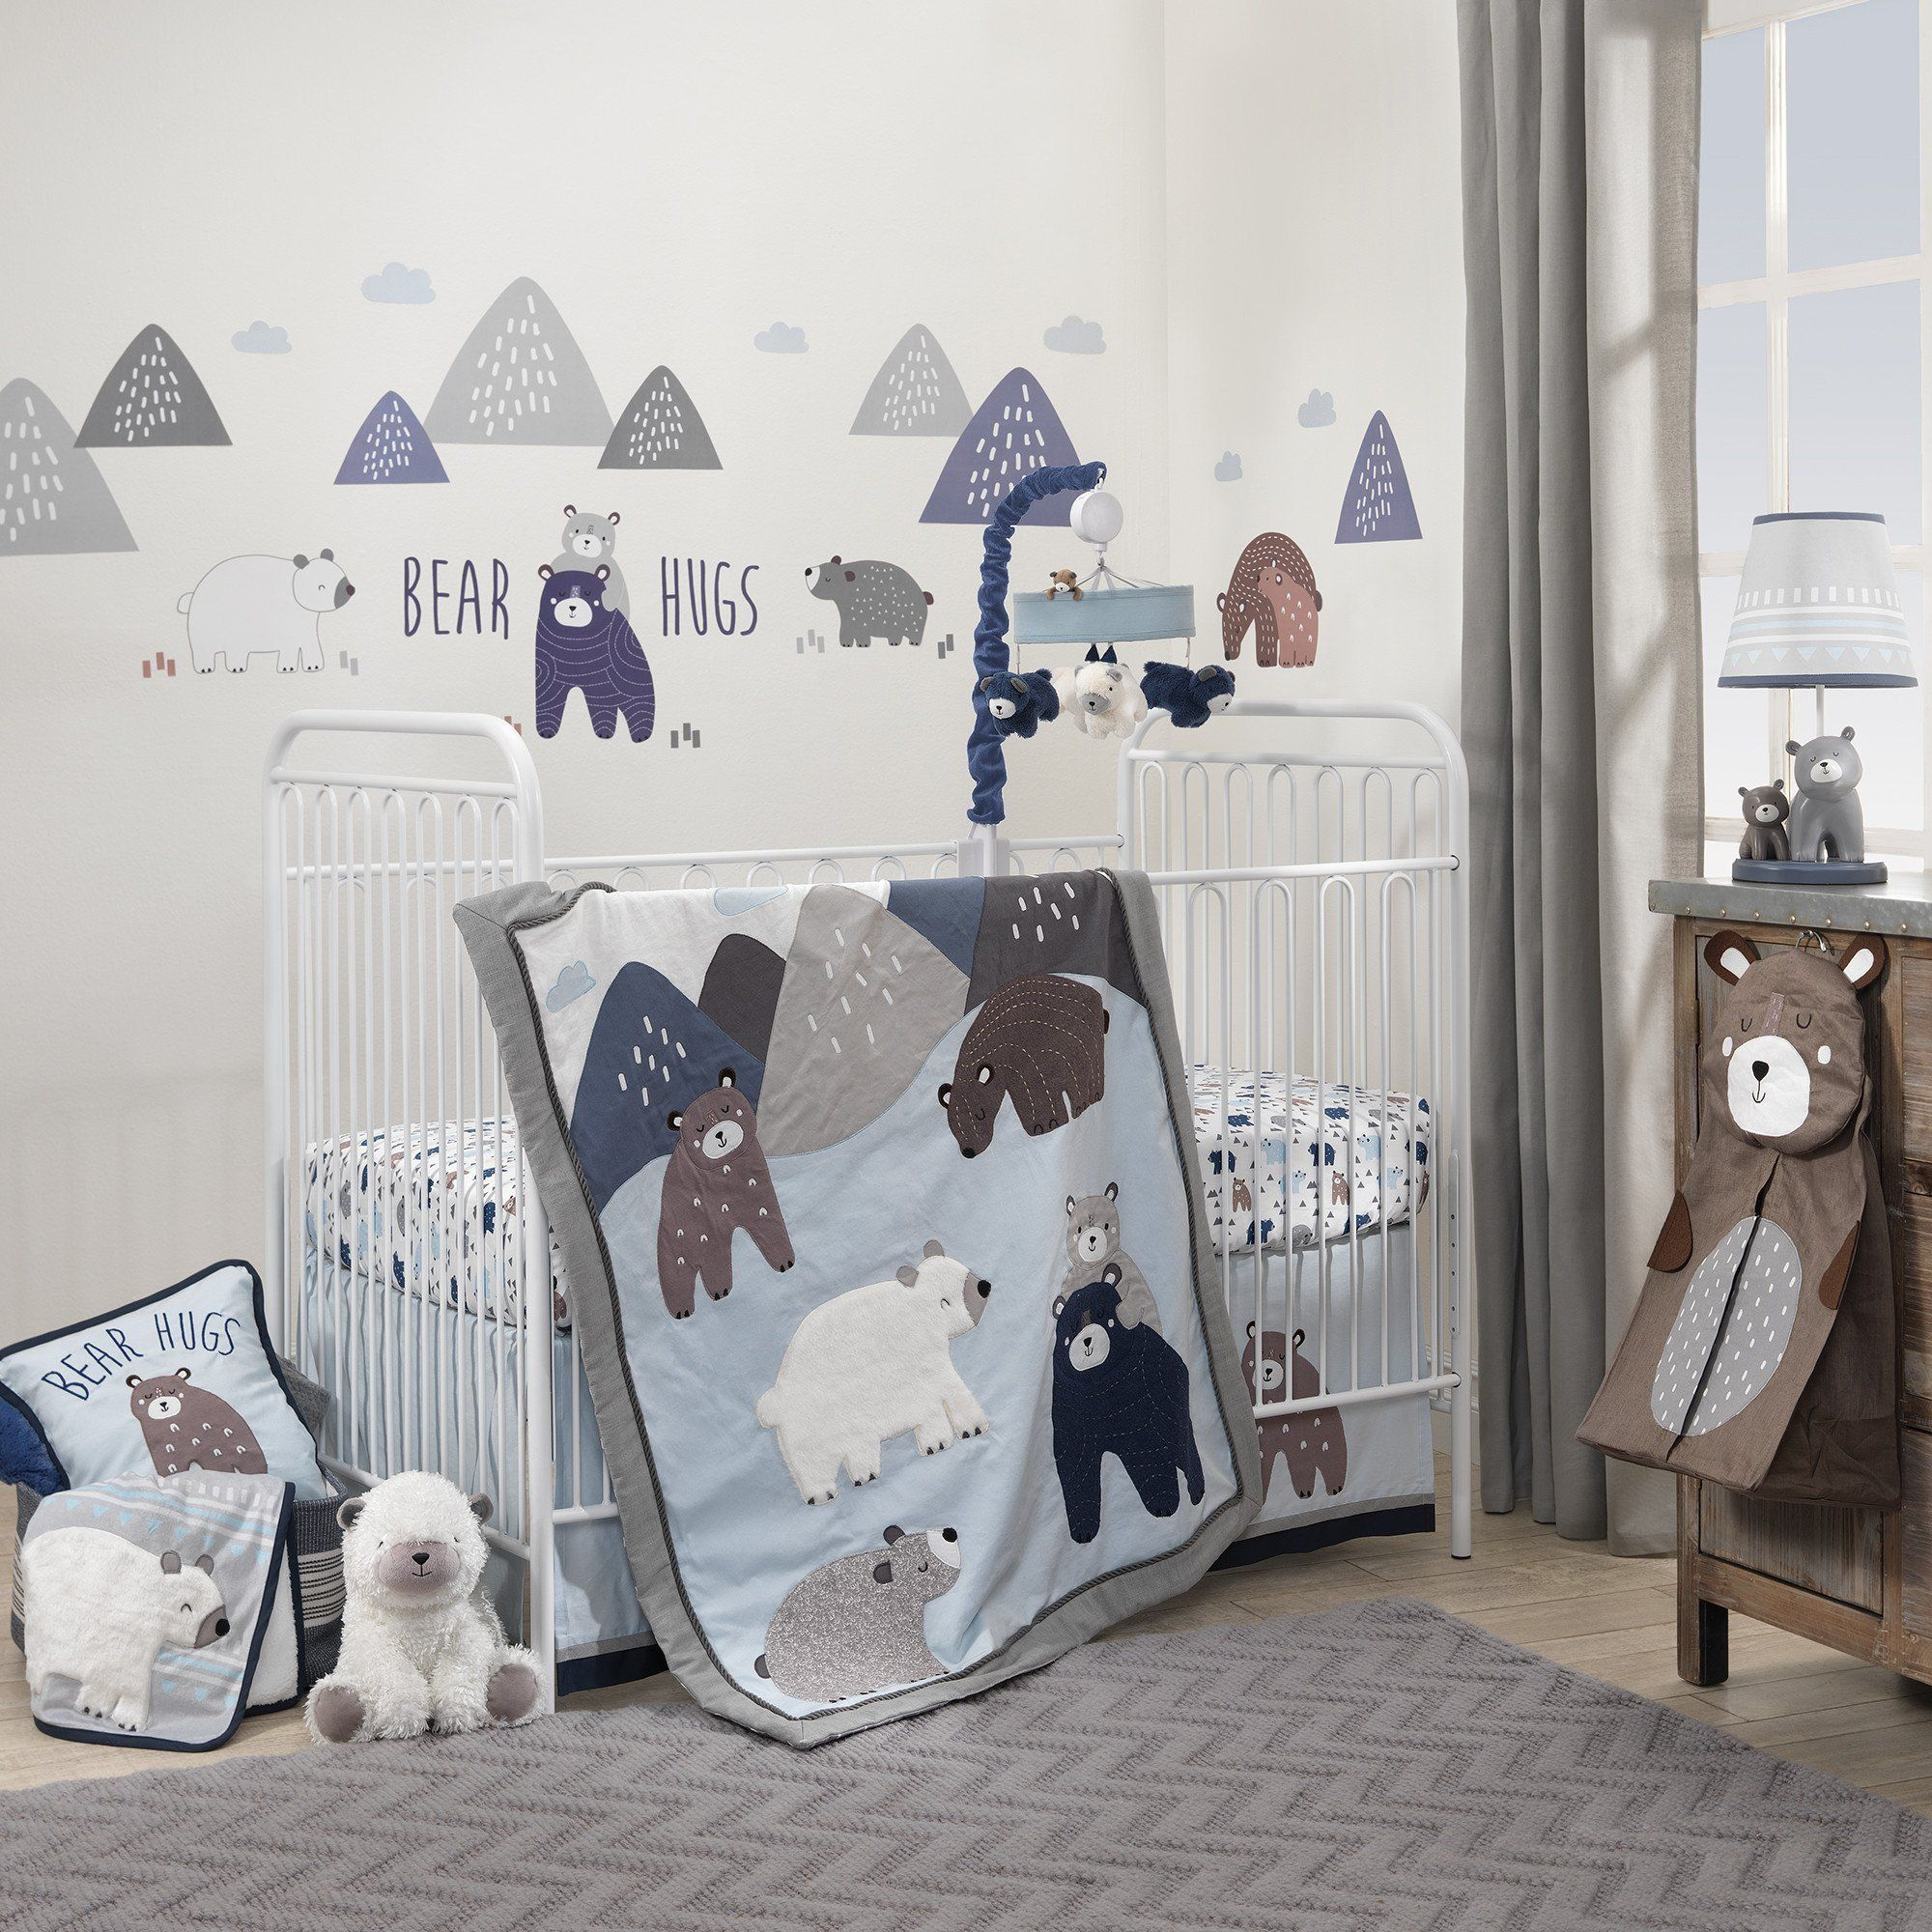 Signature Montana 6 Piece Crib Bedding Set Crib Bedding Boy Crib Bedding Crib Bedding Sets